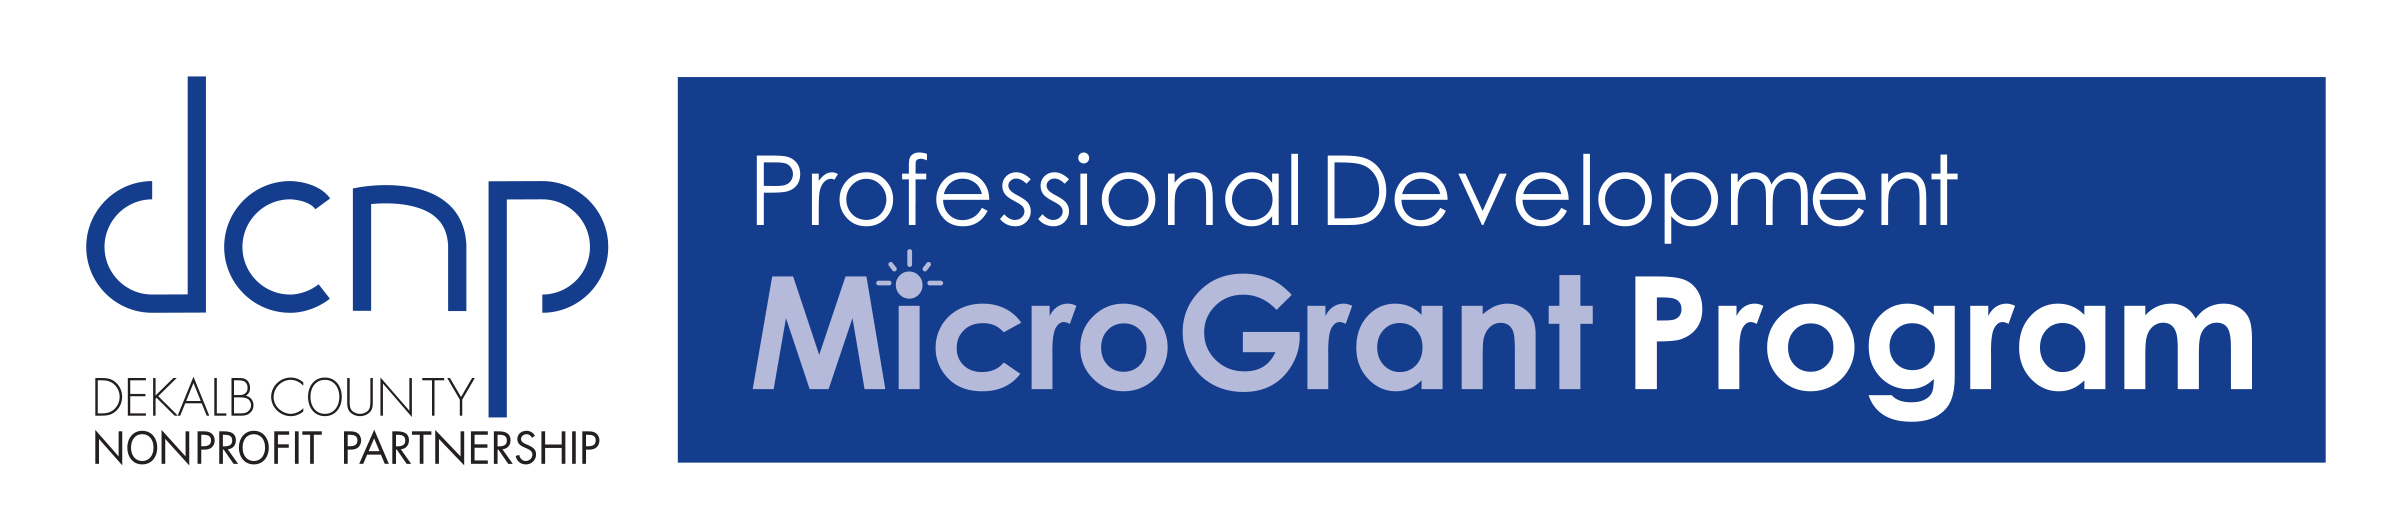 DCNP_MicroGrant Program